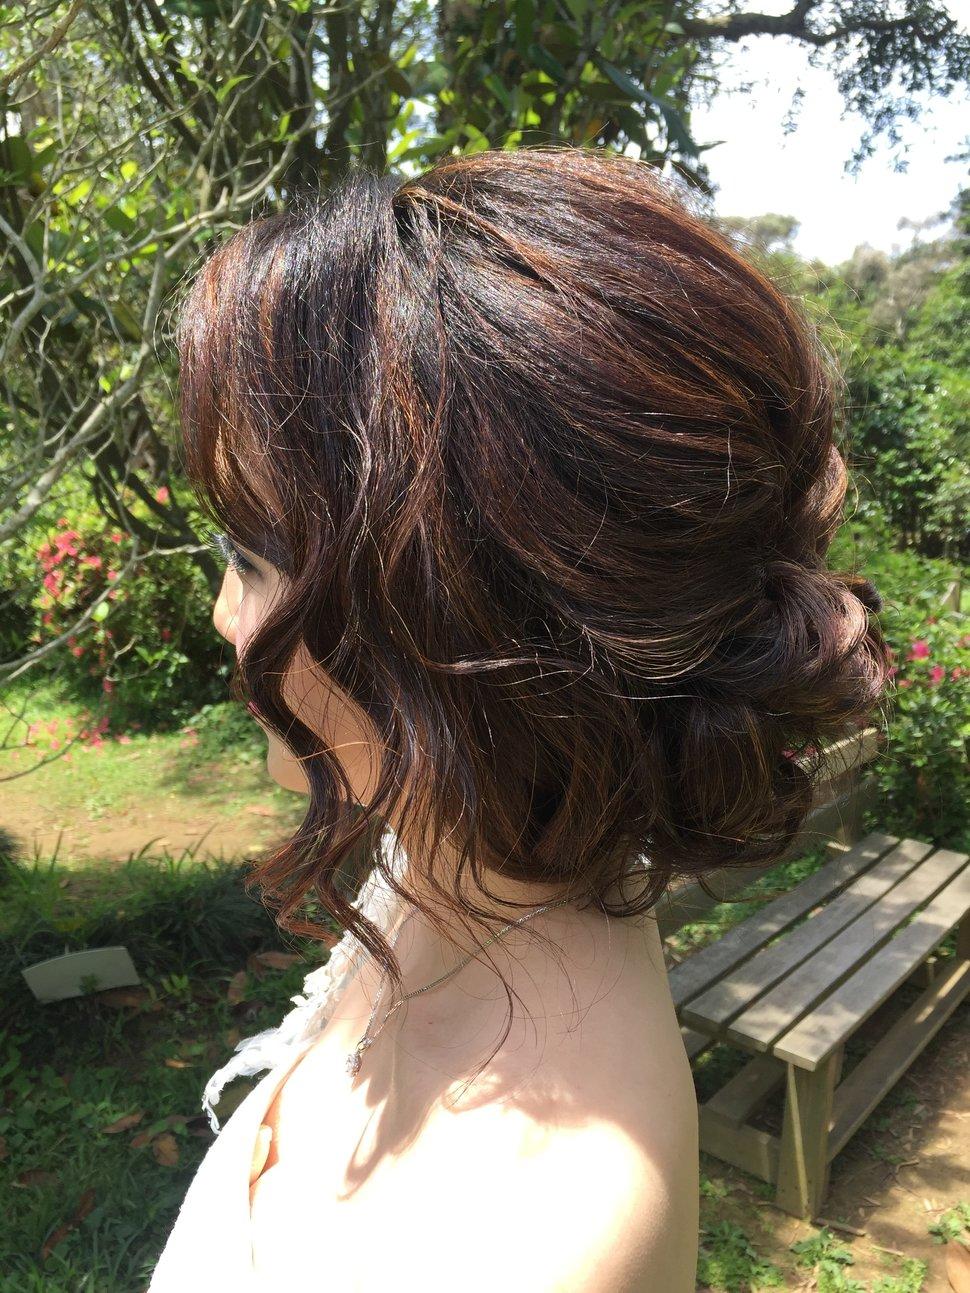 IMG_8992 - Jojo chen Makeup新娘秘書《結婚吧》